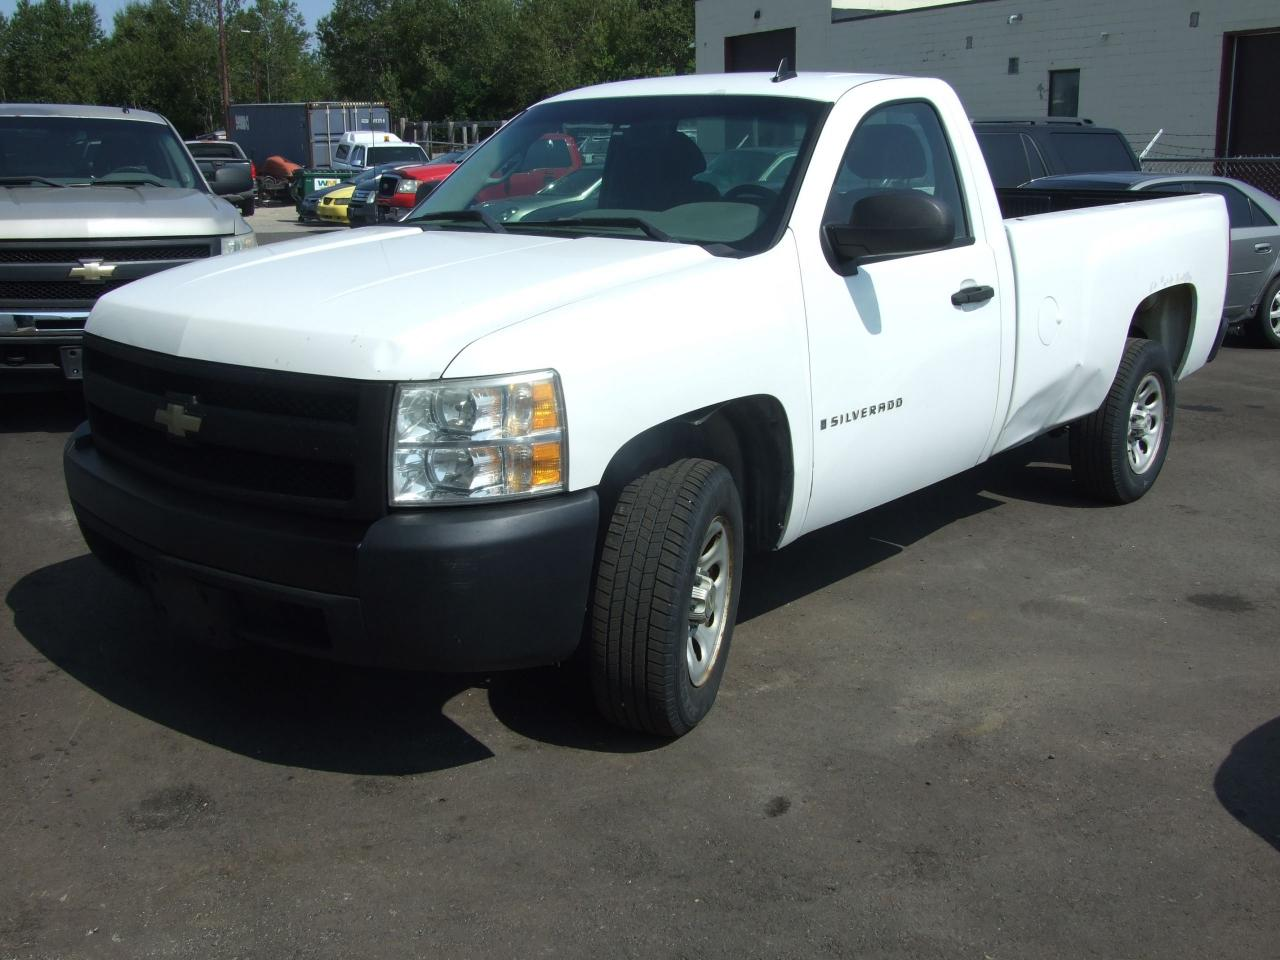 Photo of White 2007 Chevrolet Silverado 1500